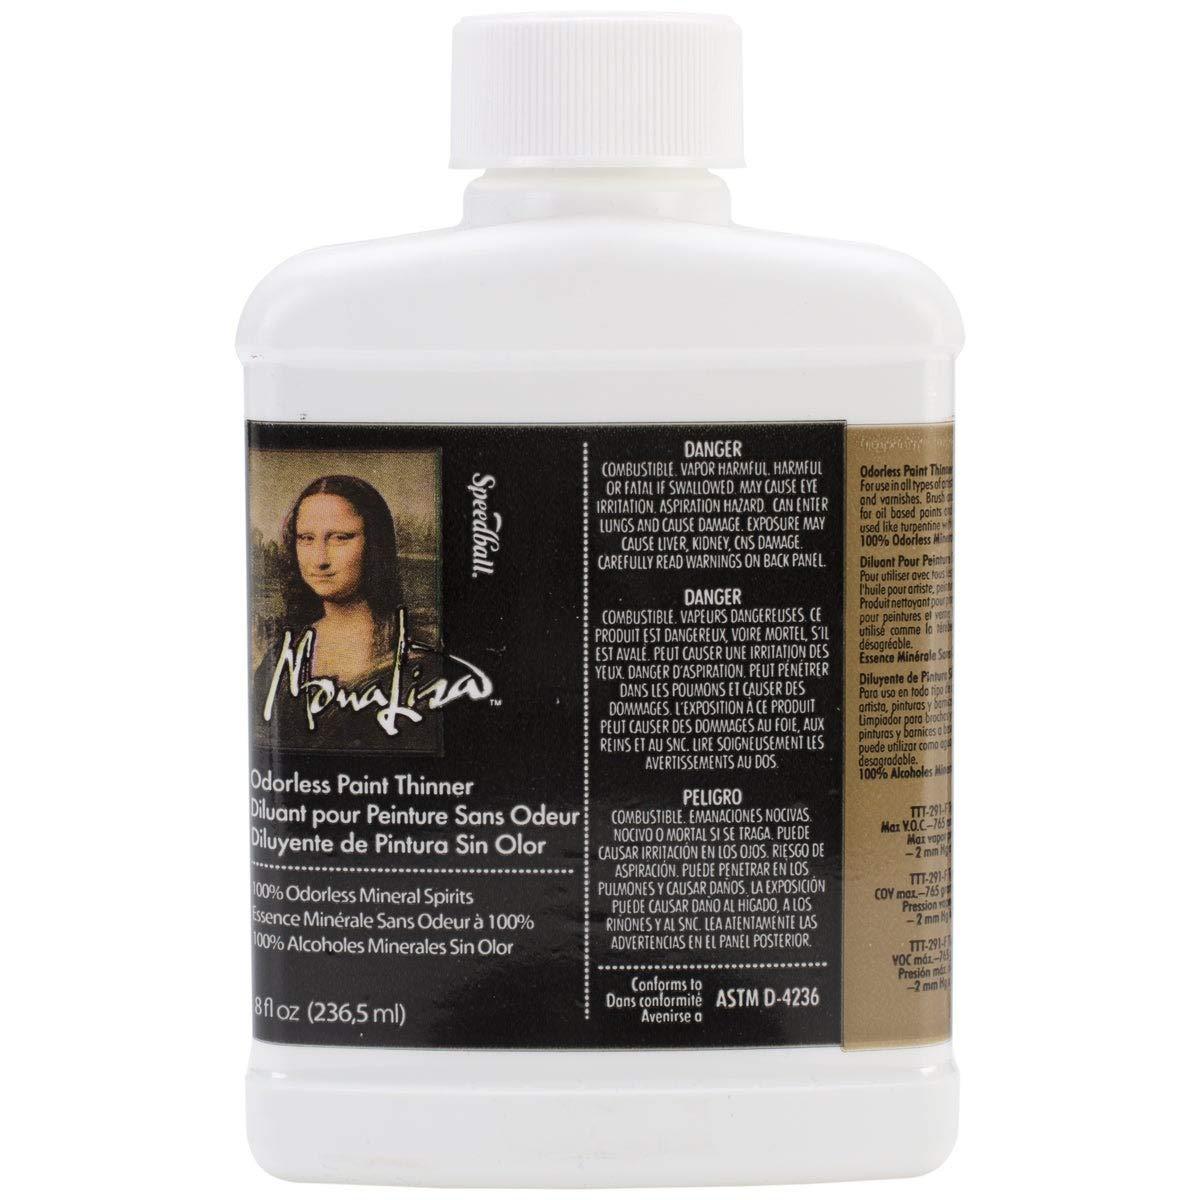 Speedball Art Products 190008 8-Ounce Mona Lisa Odorless Paint Thinner by Speedball